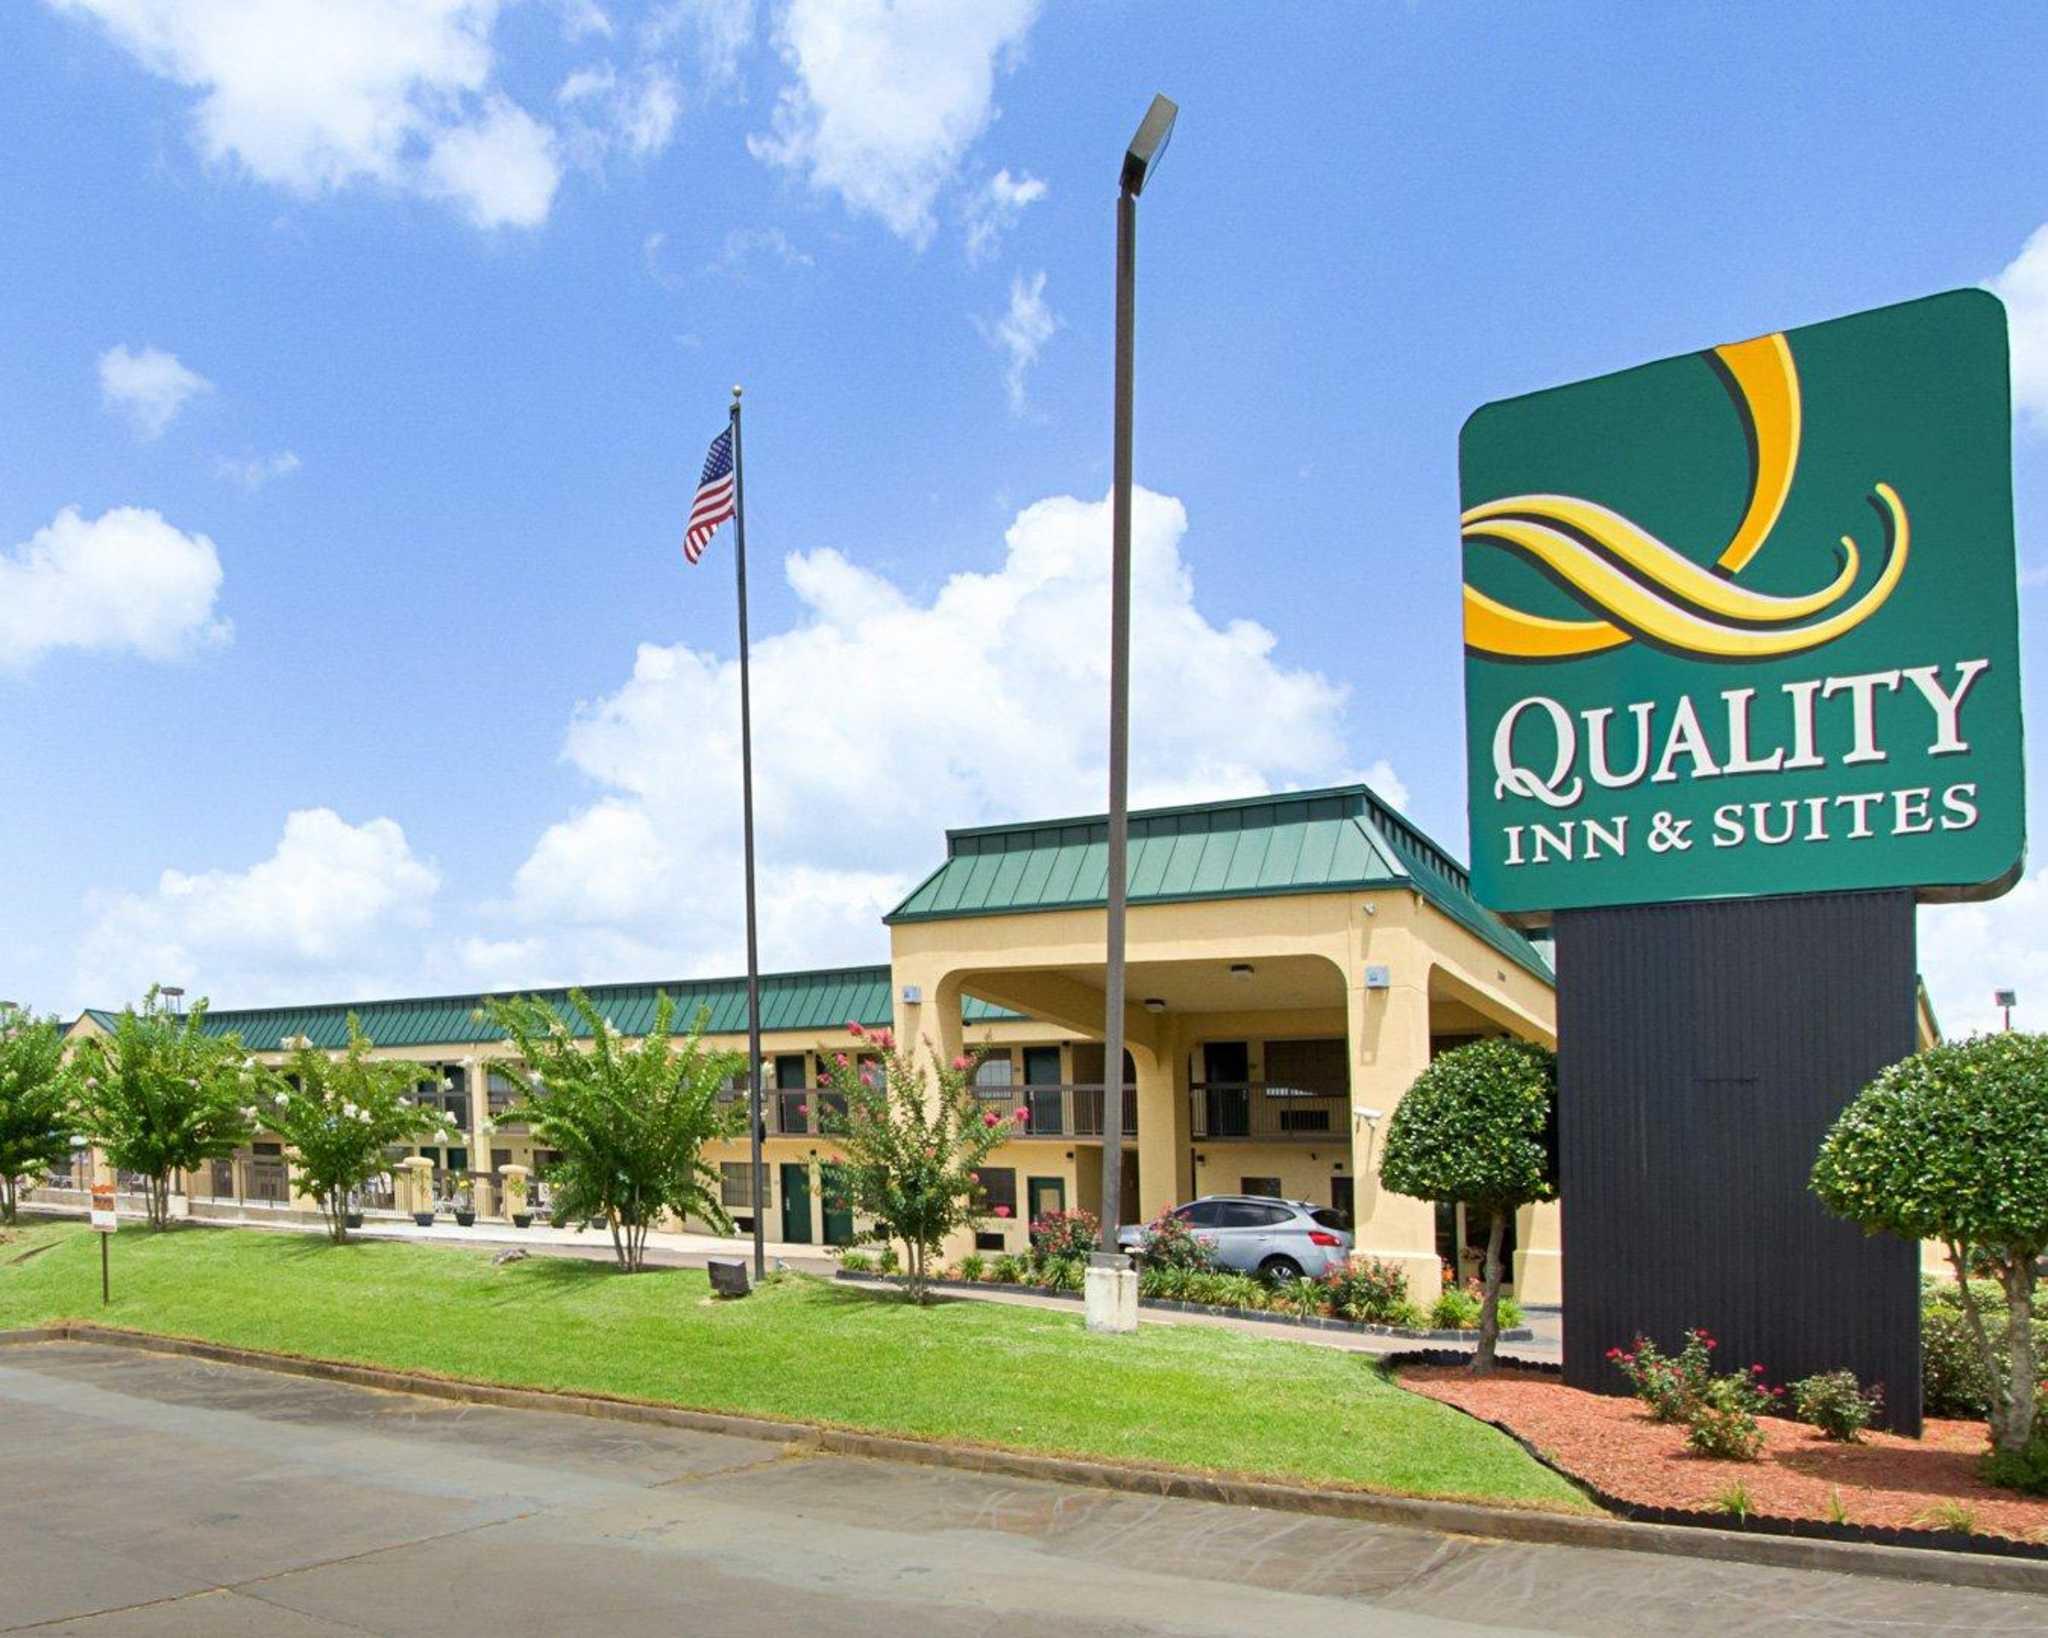 Quality Inn & Suites Southwest image 2